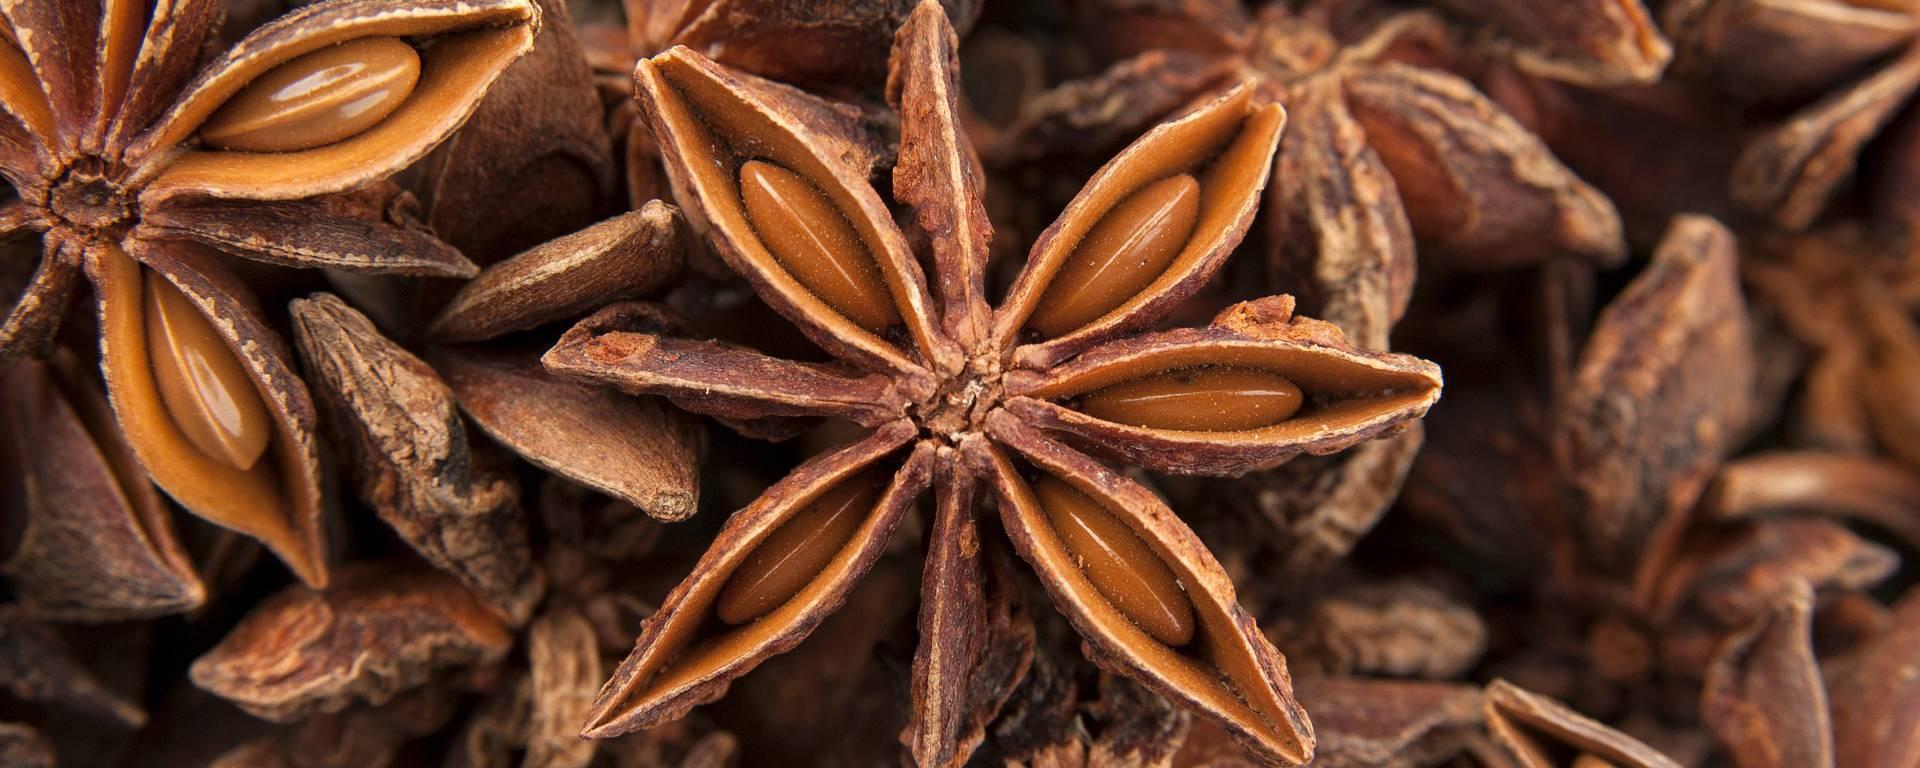 anis tisane bien-être cocconing herbes plantes nature